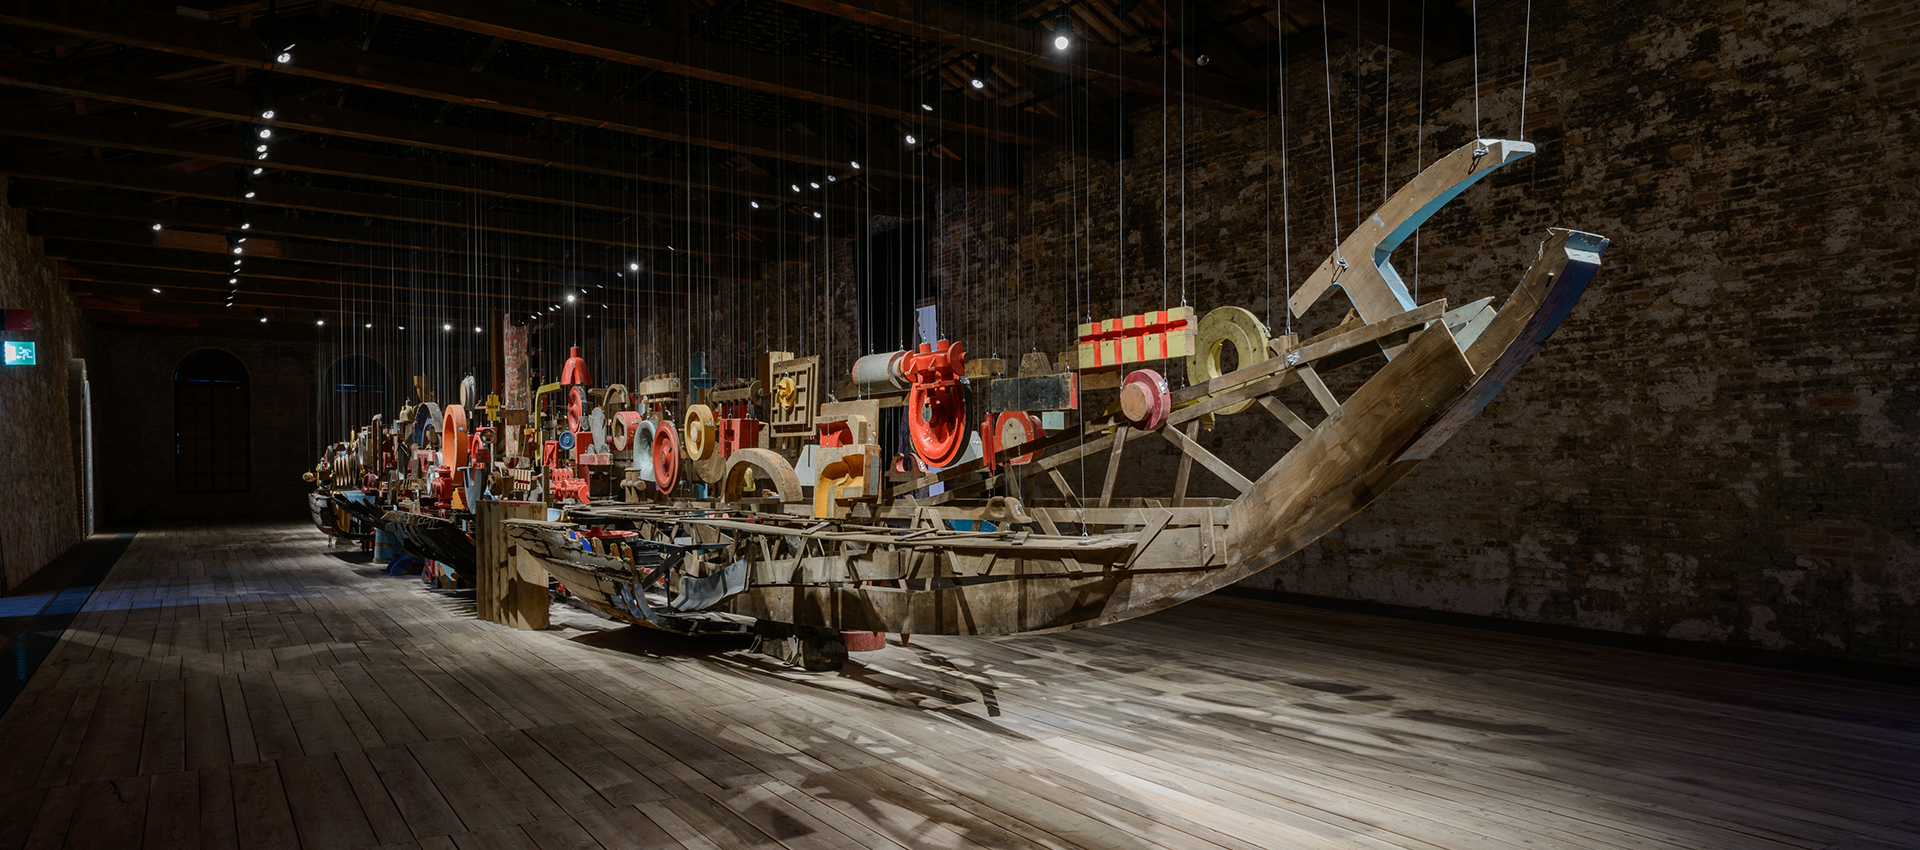 Darzanà. Pabellón turco de la Bienal de Venecia 2016. Imagen cortesía de La Bienal de venecia